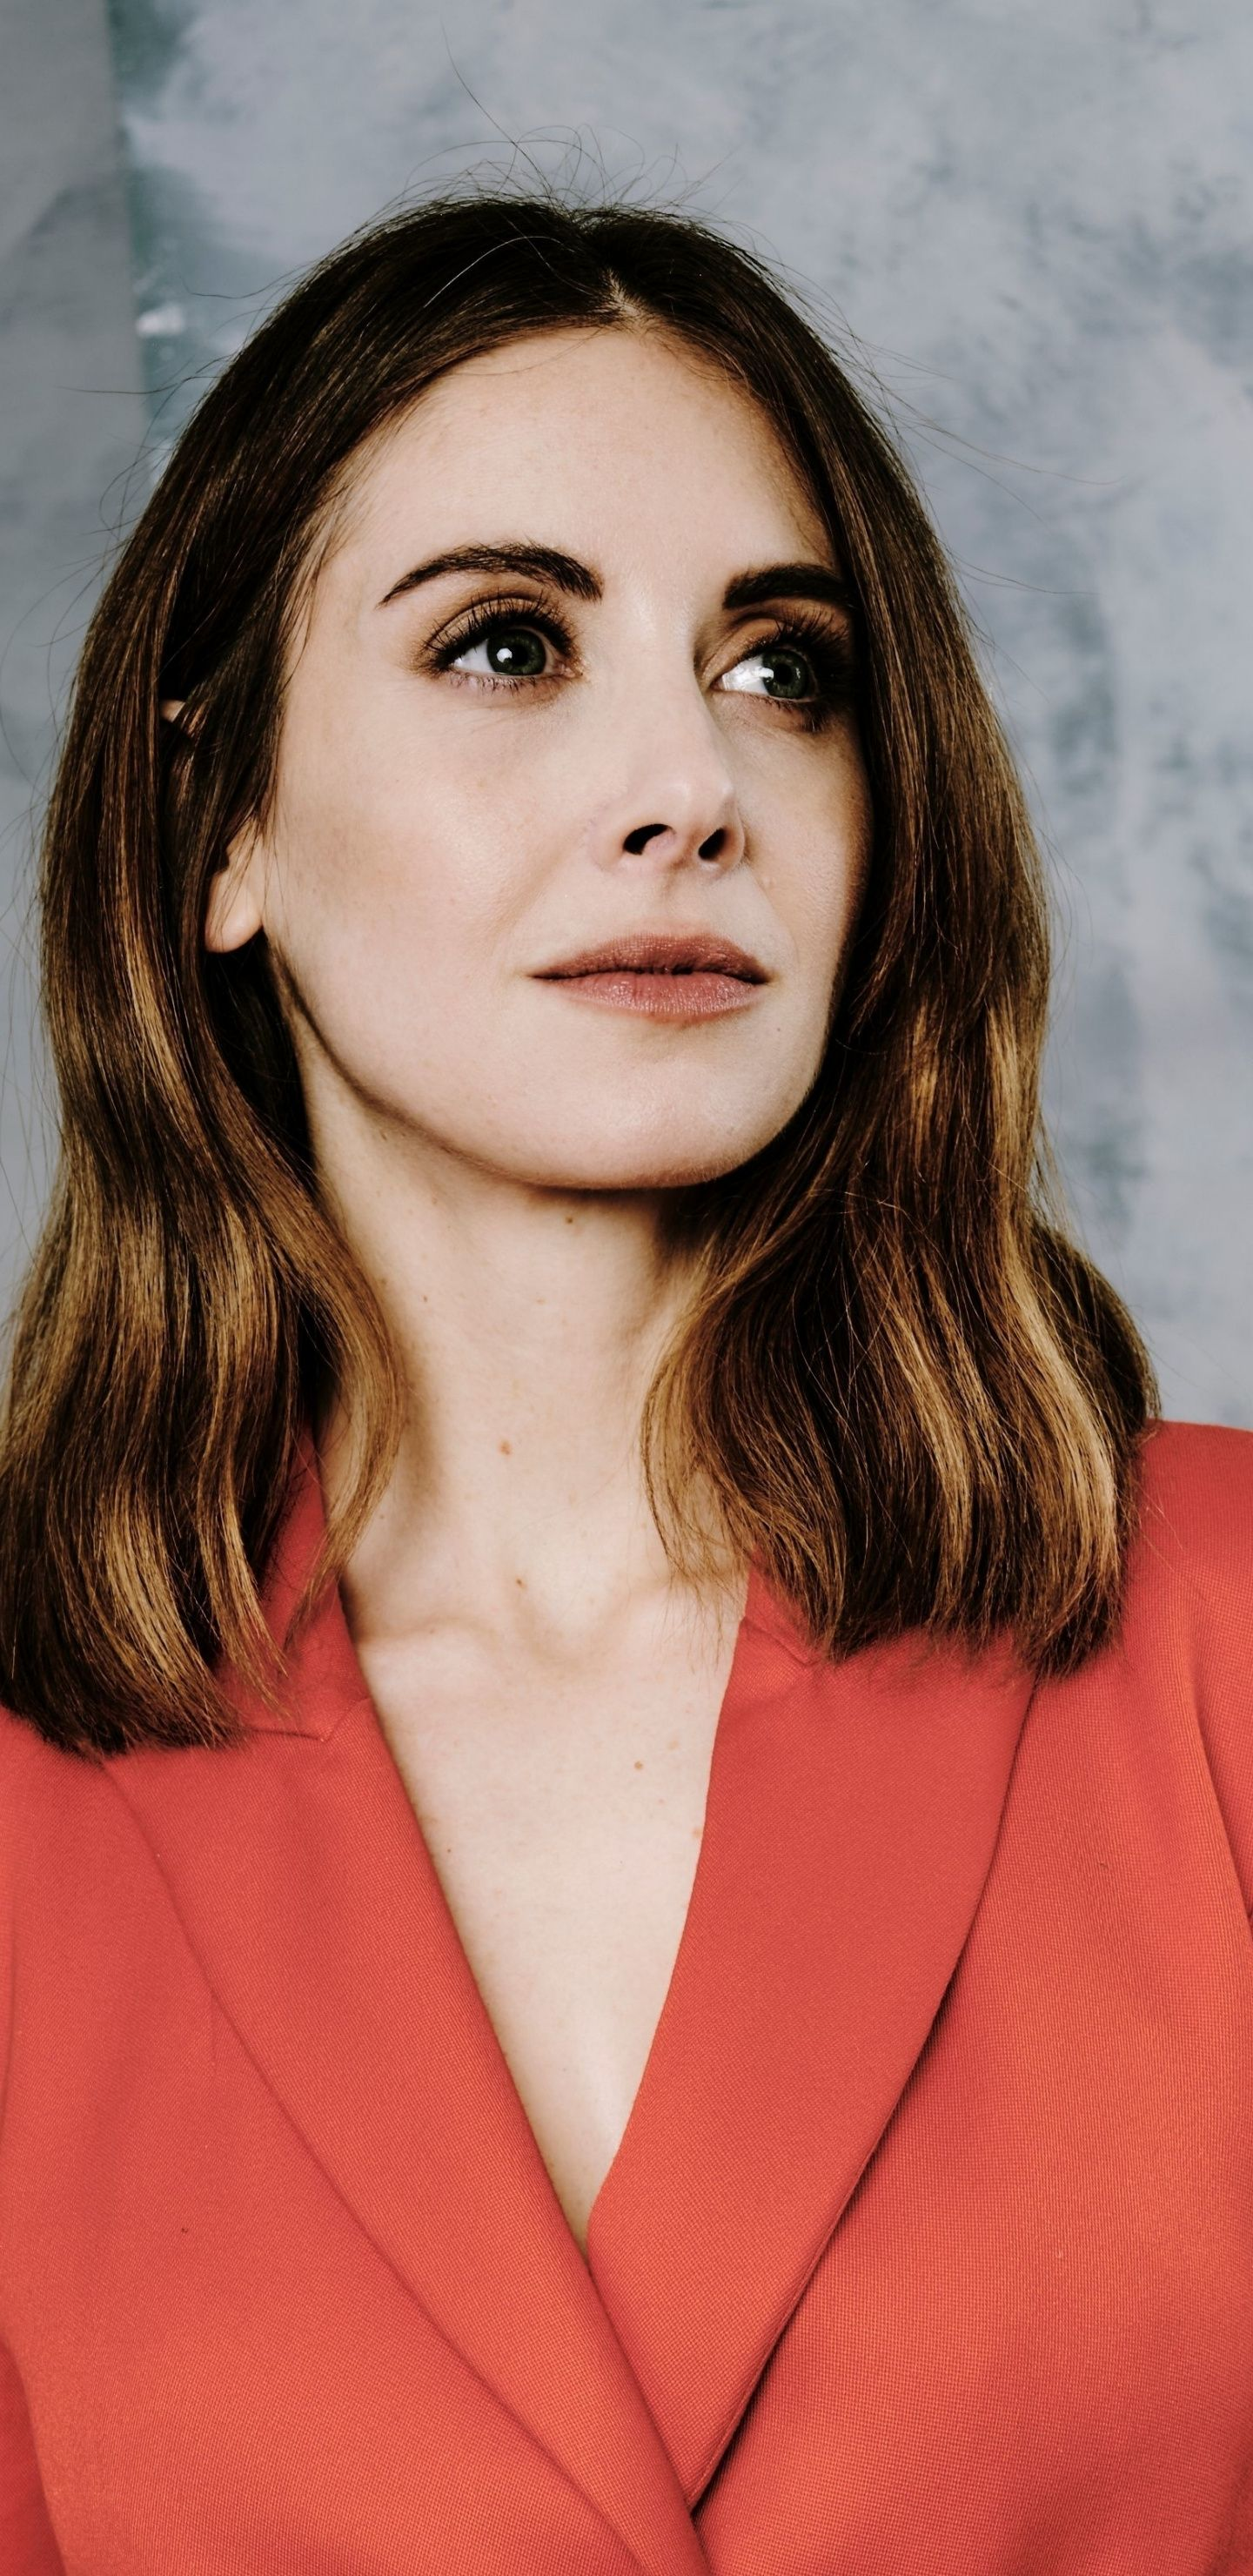 1440x2960 Alison Brie Beautiful Actress 2020 Wallpaper Celebrity Wallpapers Beautiful Actresses Beautiful Girl Hd Wallpaper